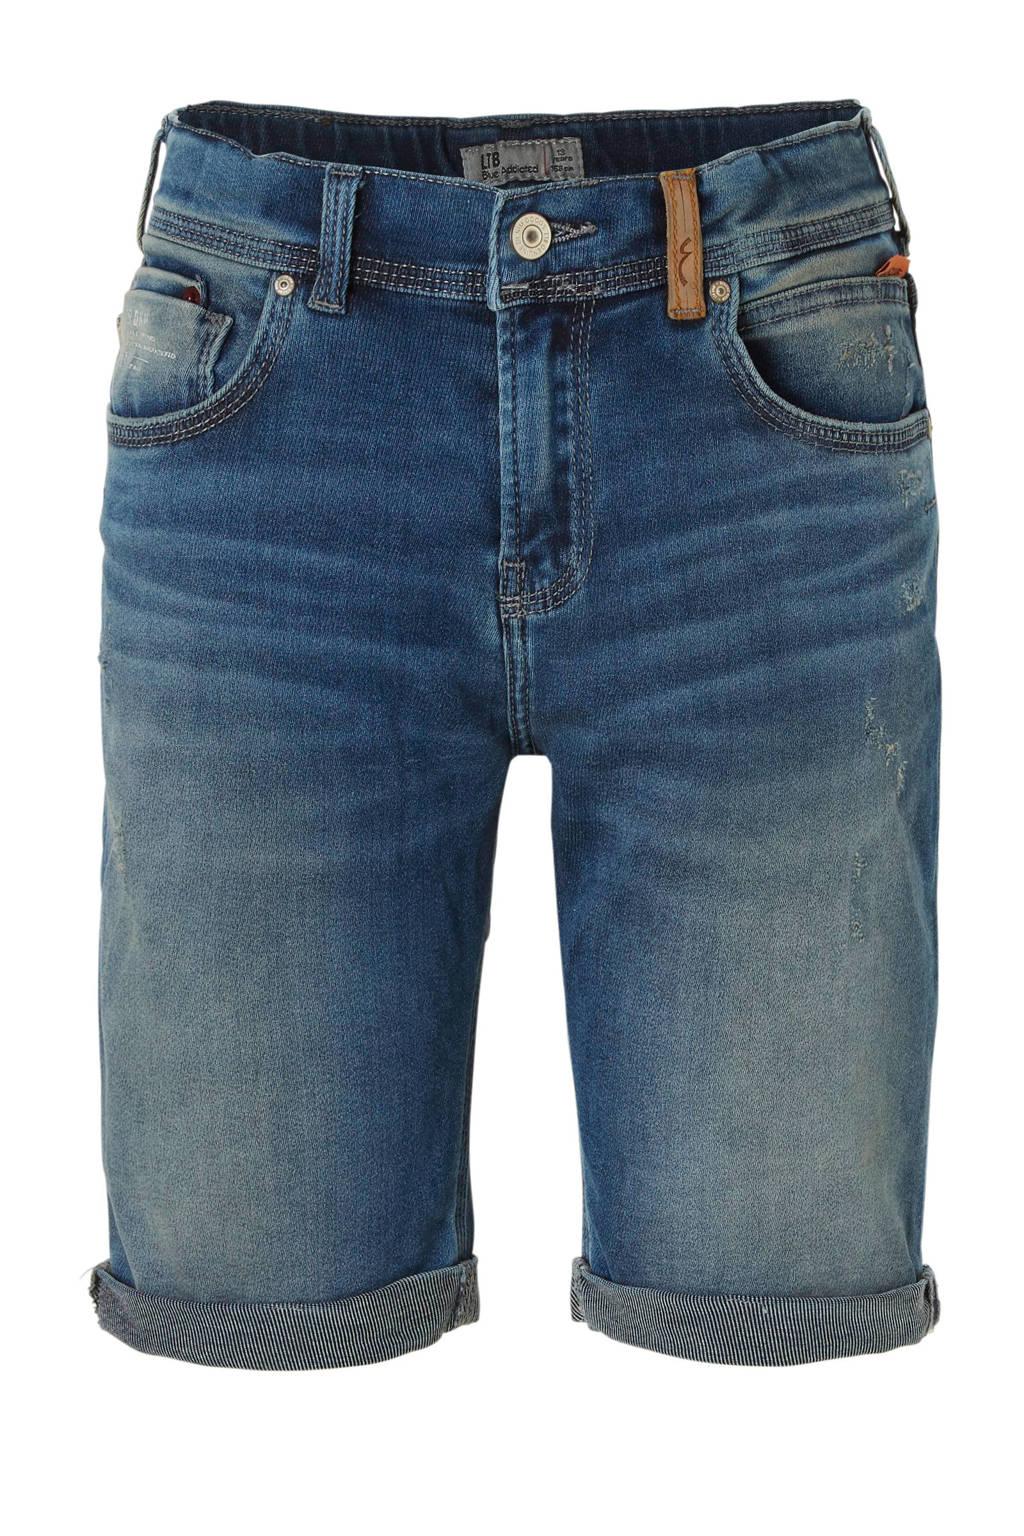 LTB slim fit jeans bermuda Corvin met slijtage, Blauw (Darnell X Wash)